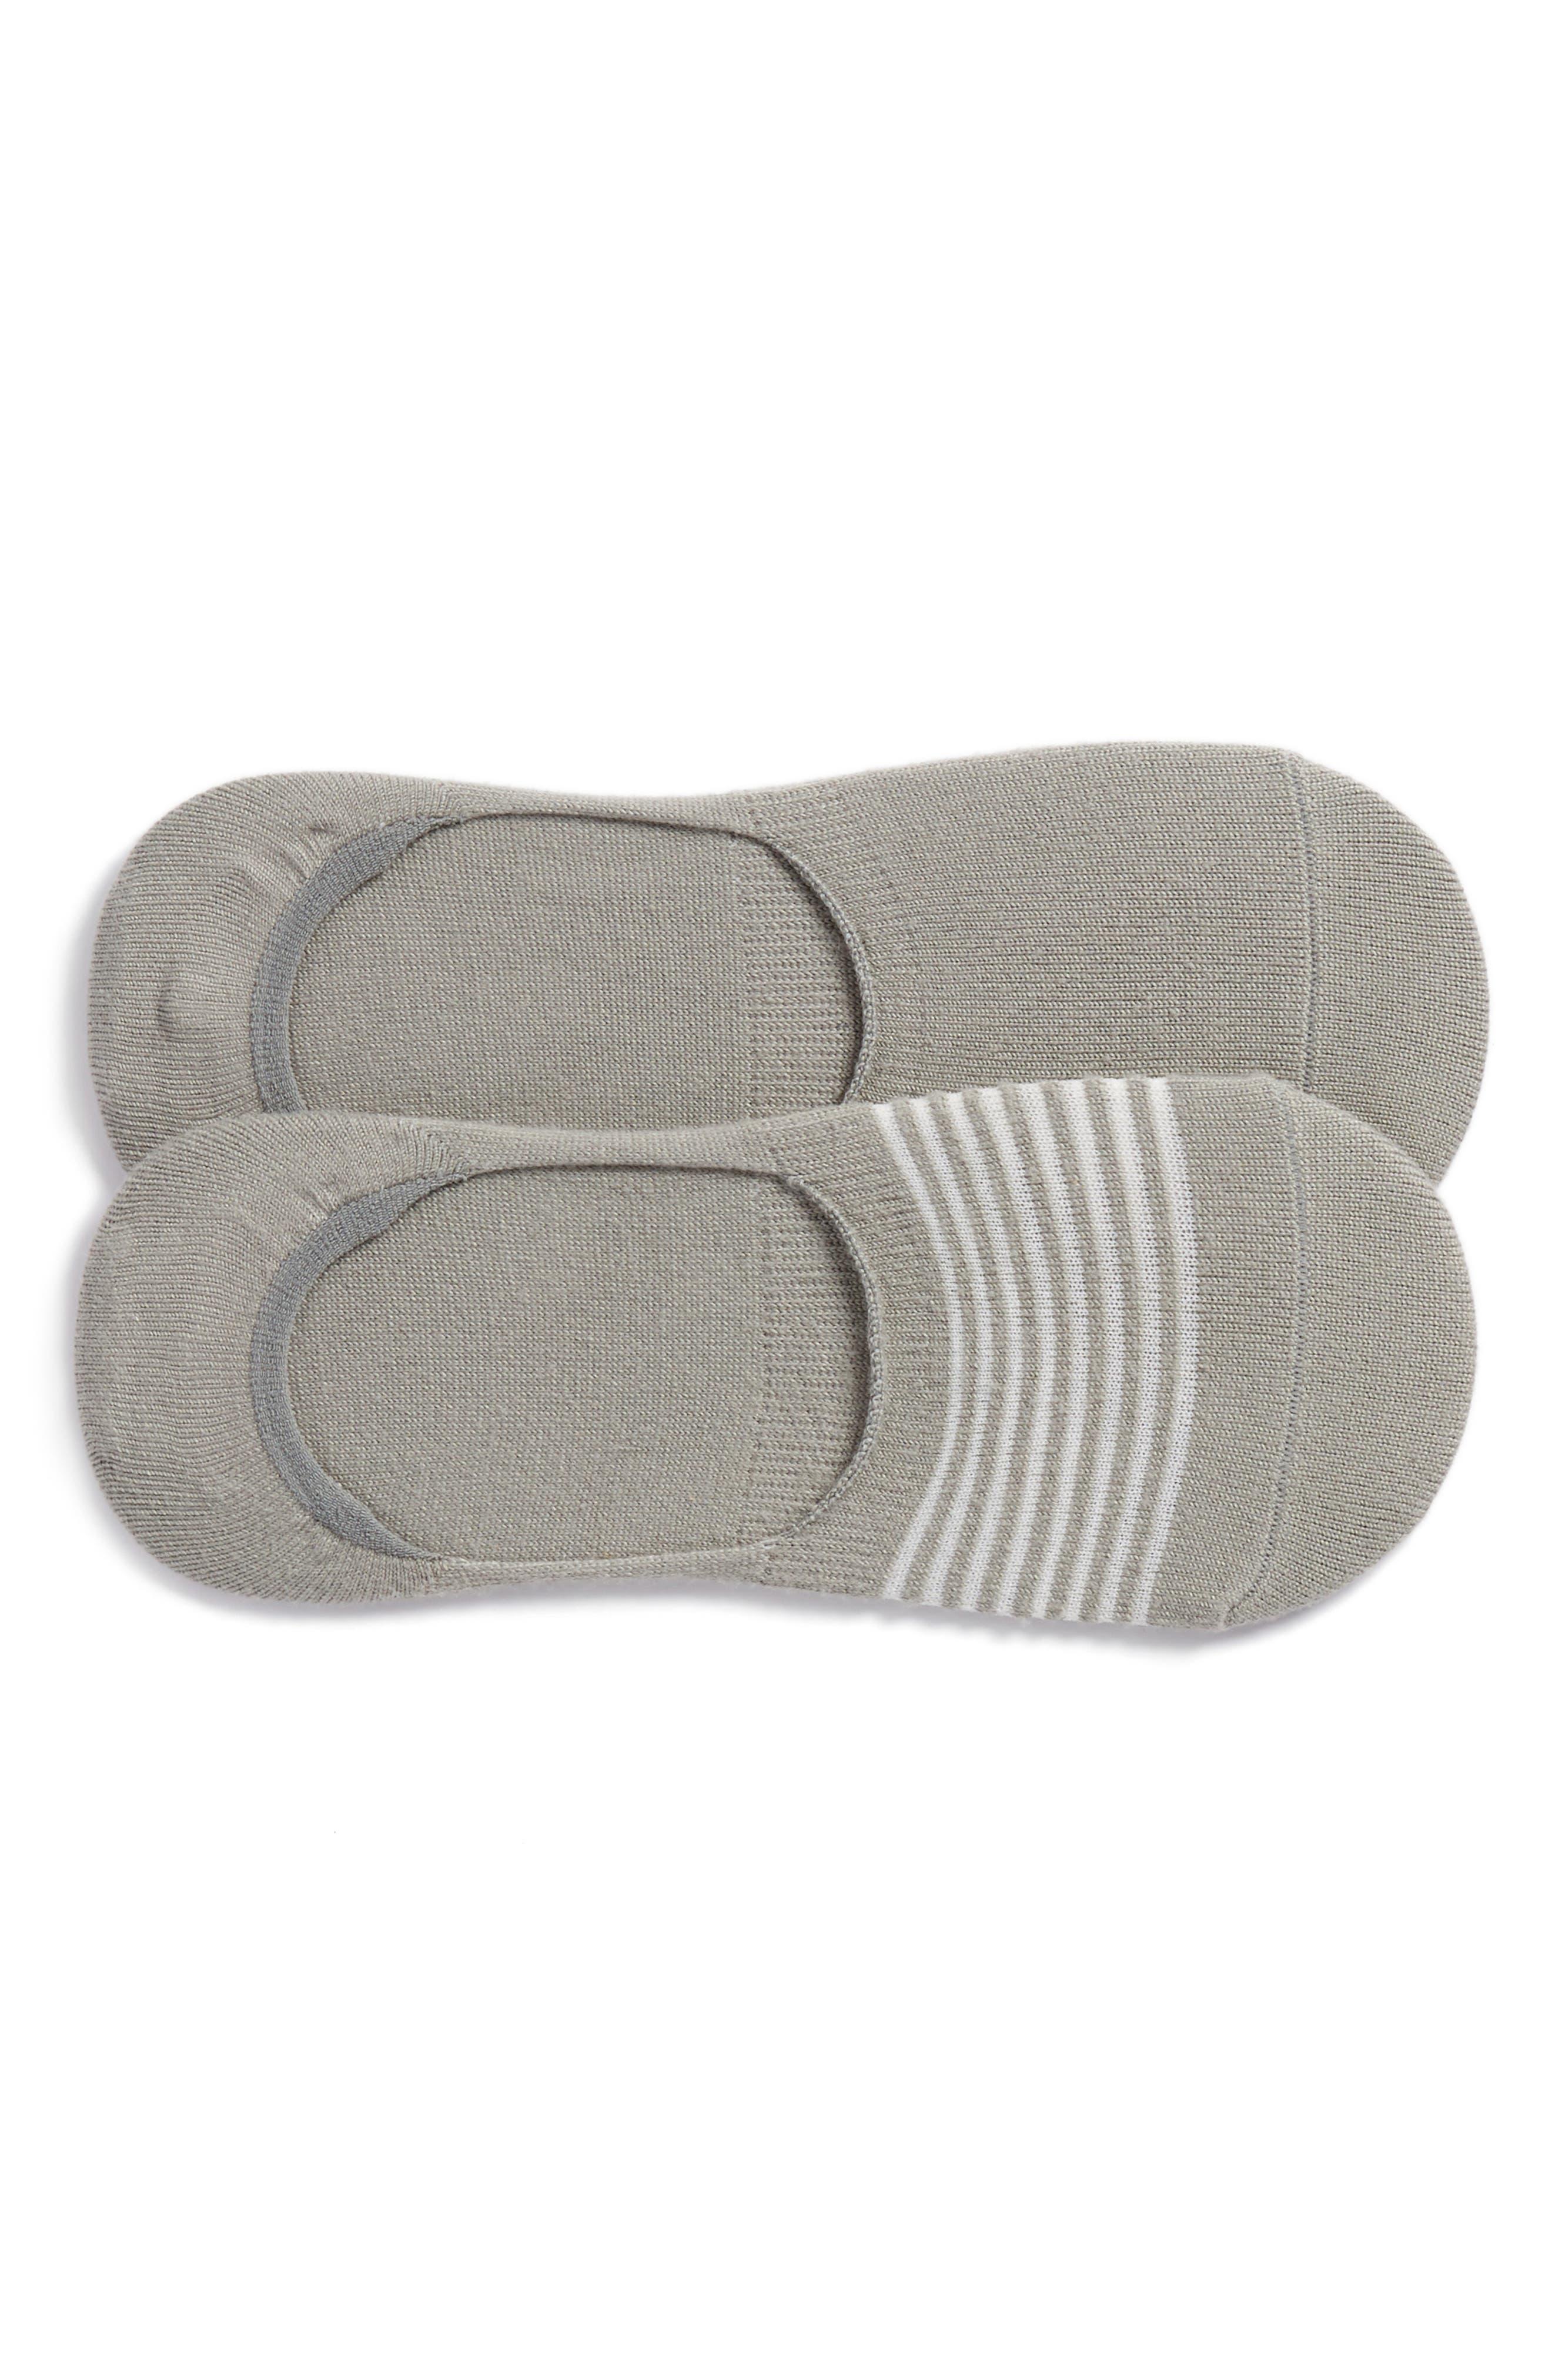 2-Pack Beach Mesh Liner Socks,                         Main,                         color, Concrete